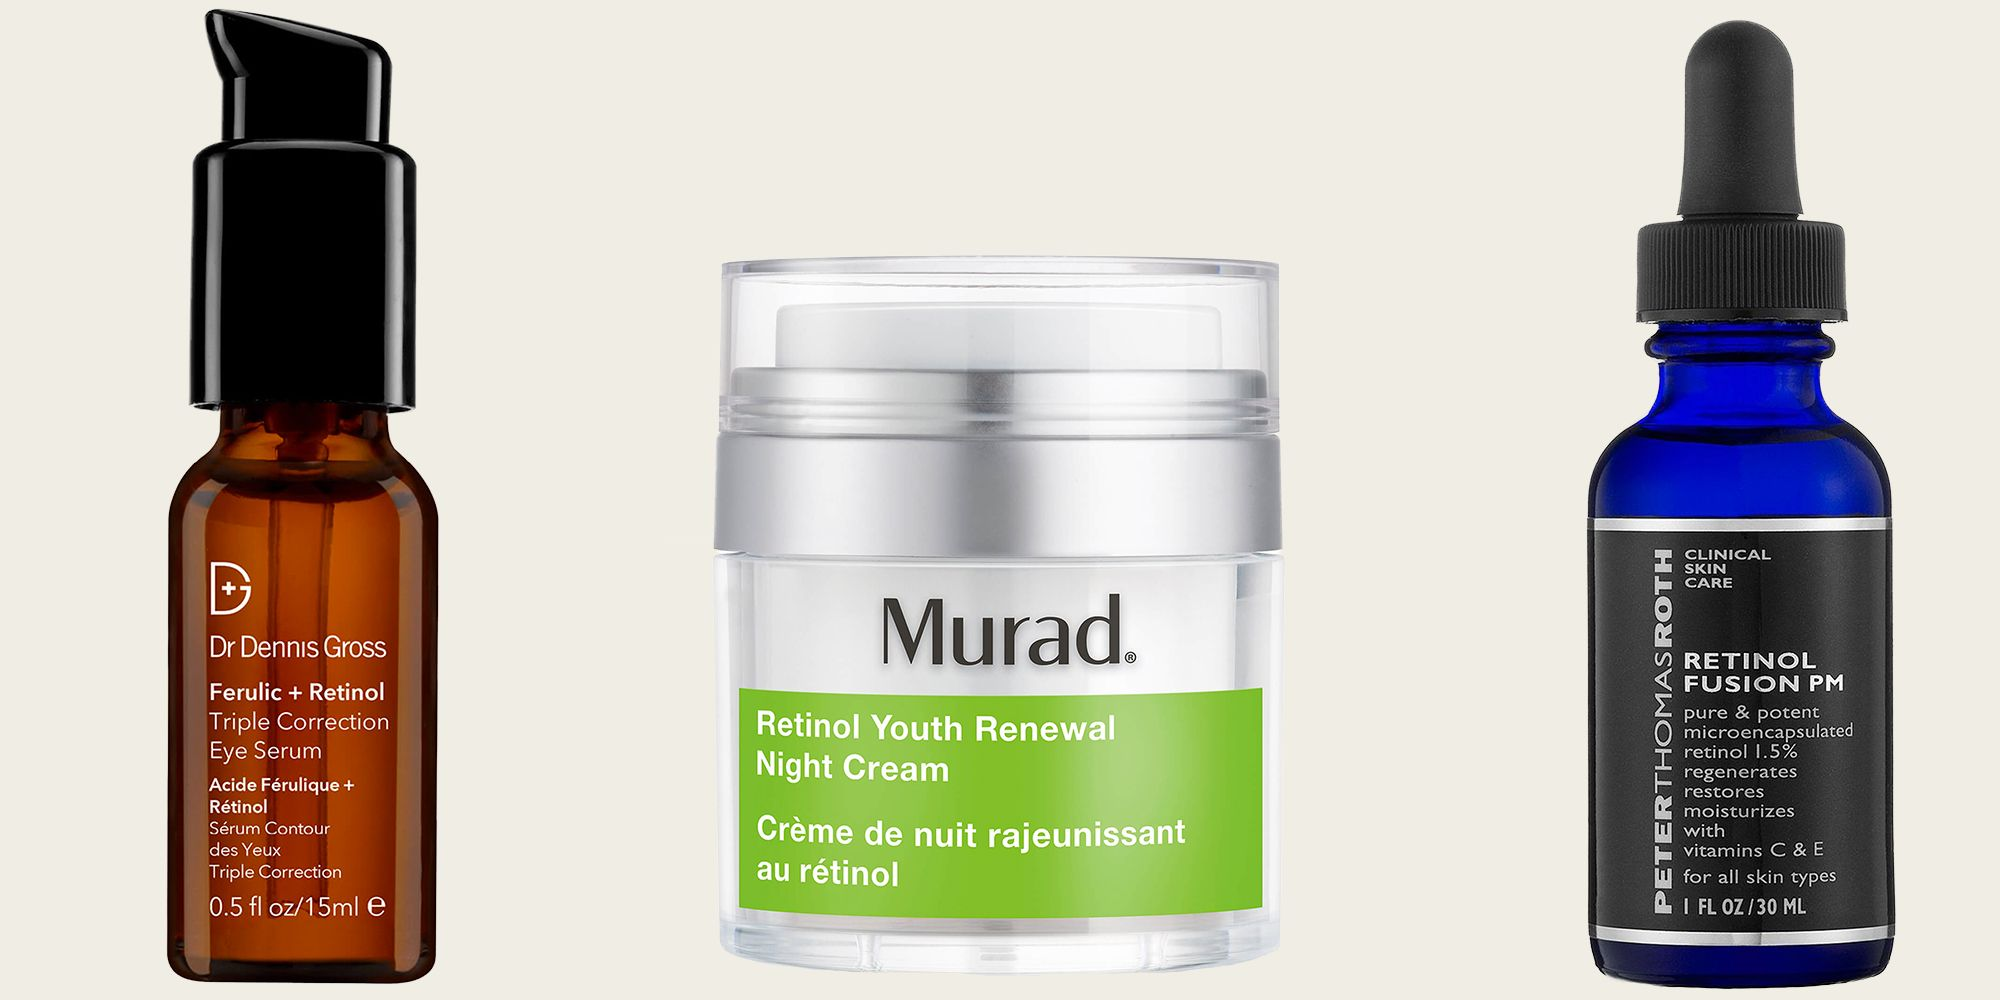 22 Best Retinol Creams Retinol Products For Acne And Wrinkles